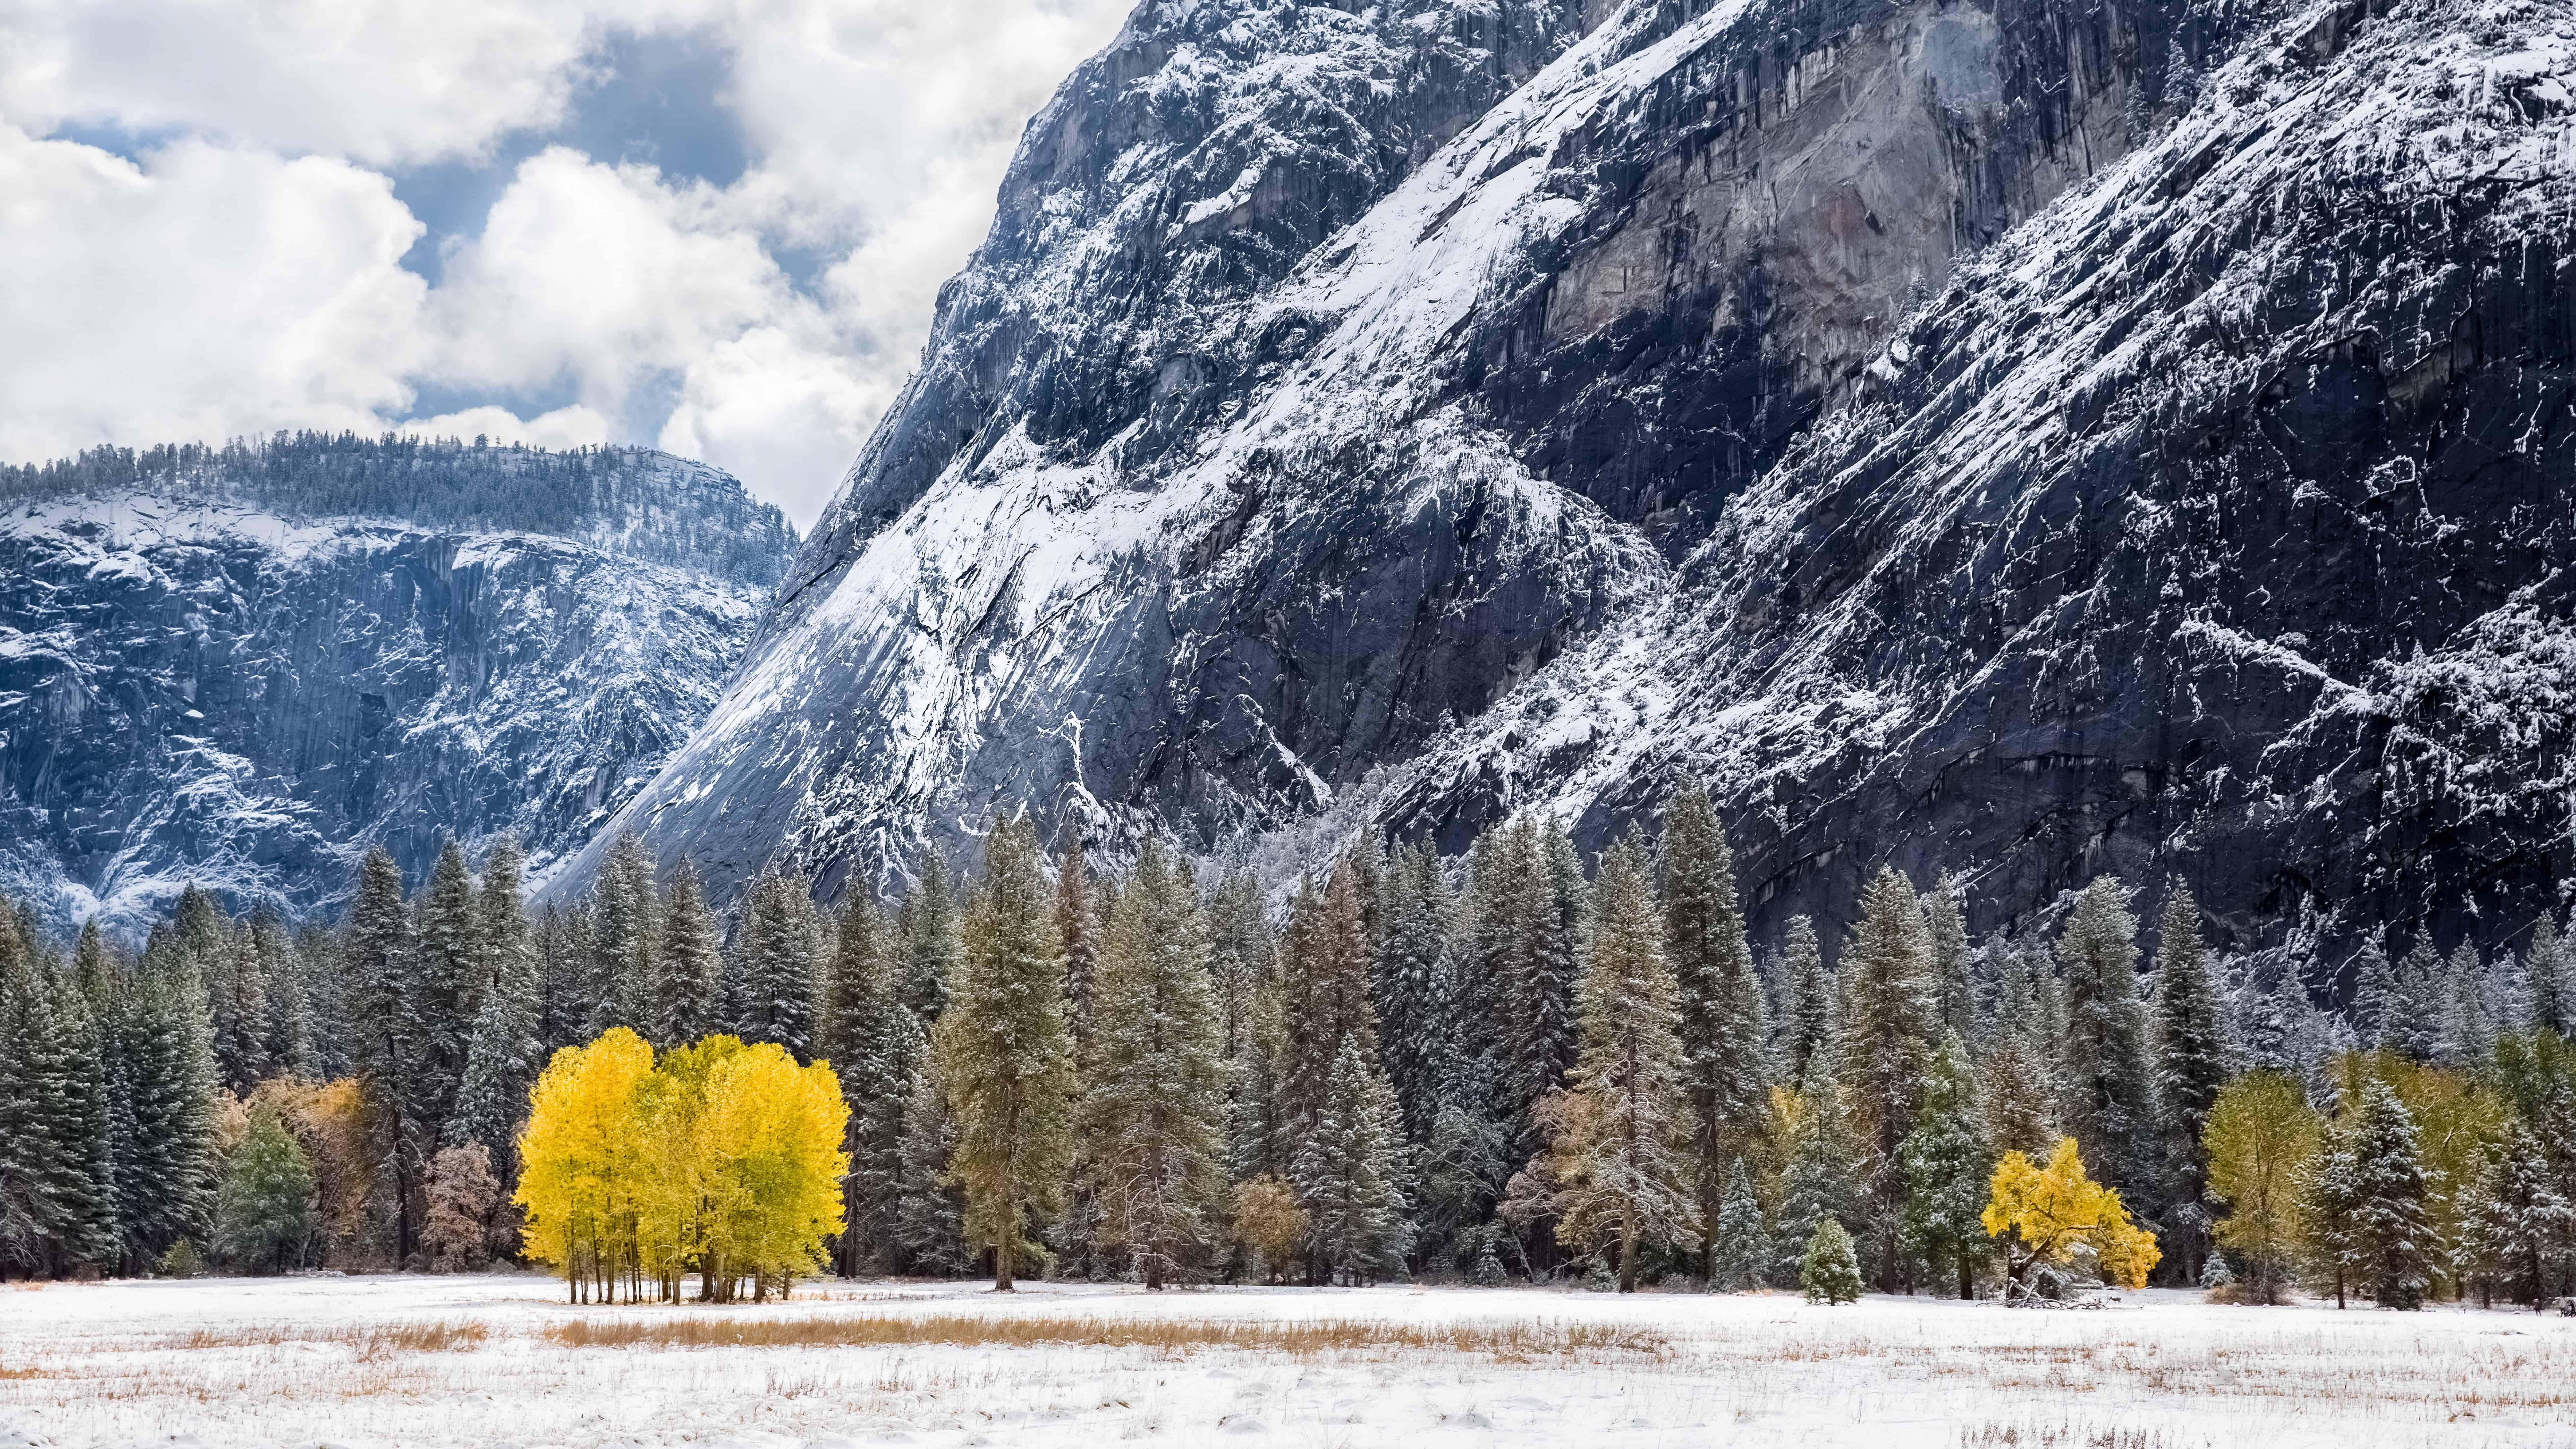 winter tuolumne meadows california united states uhd 8k wallpaper